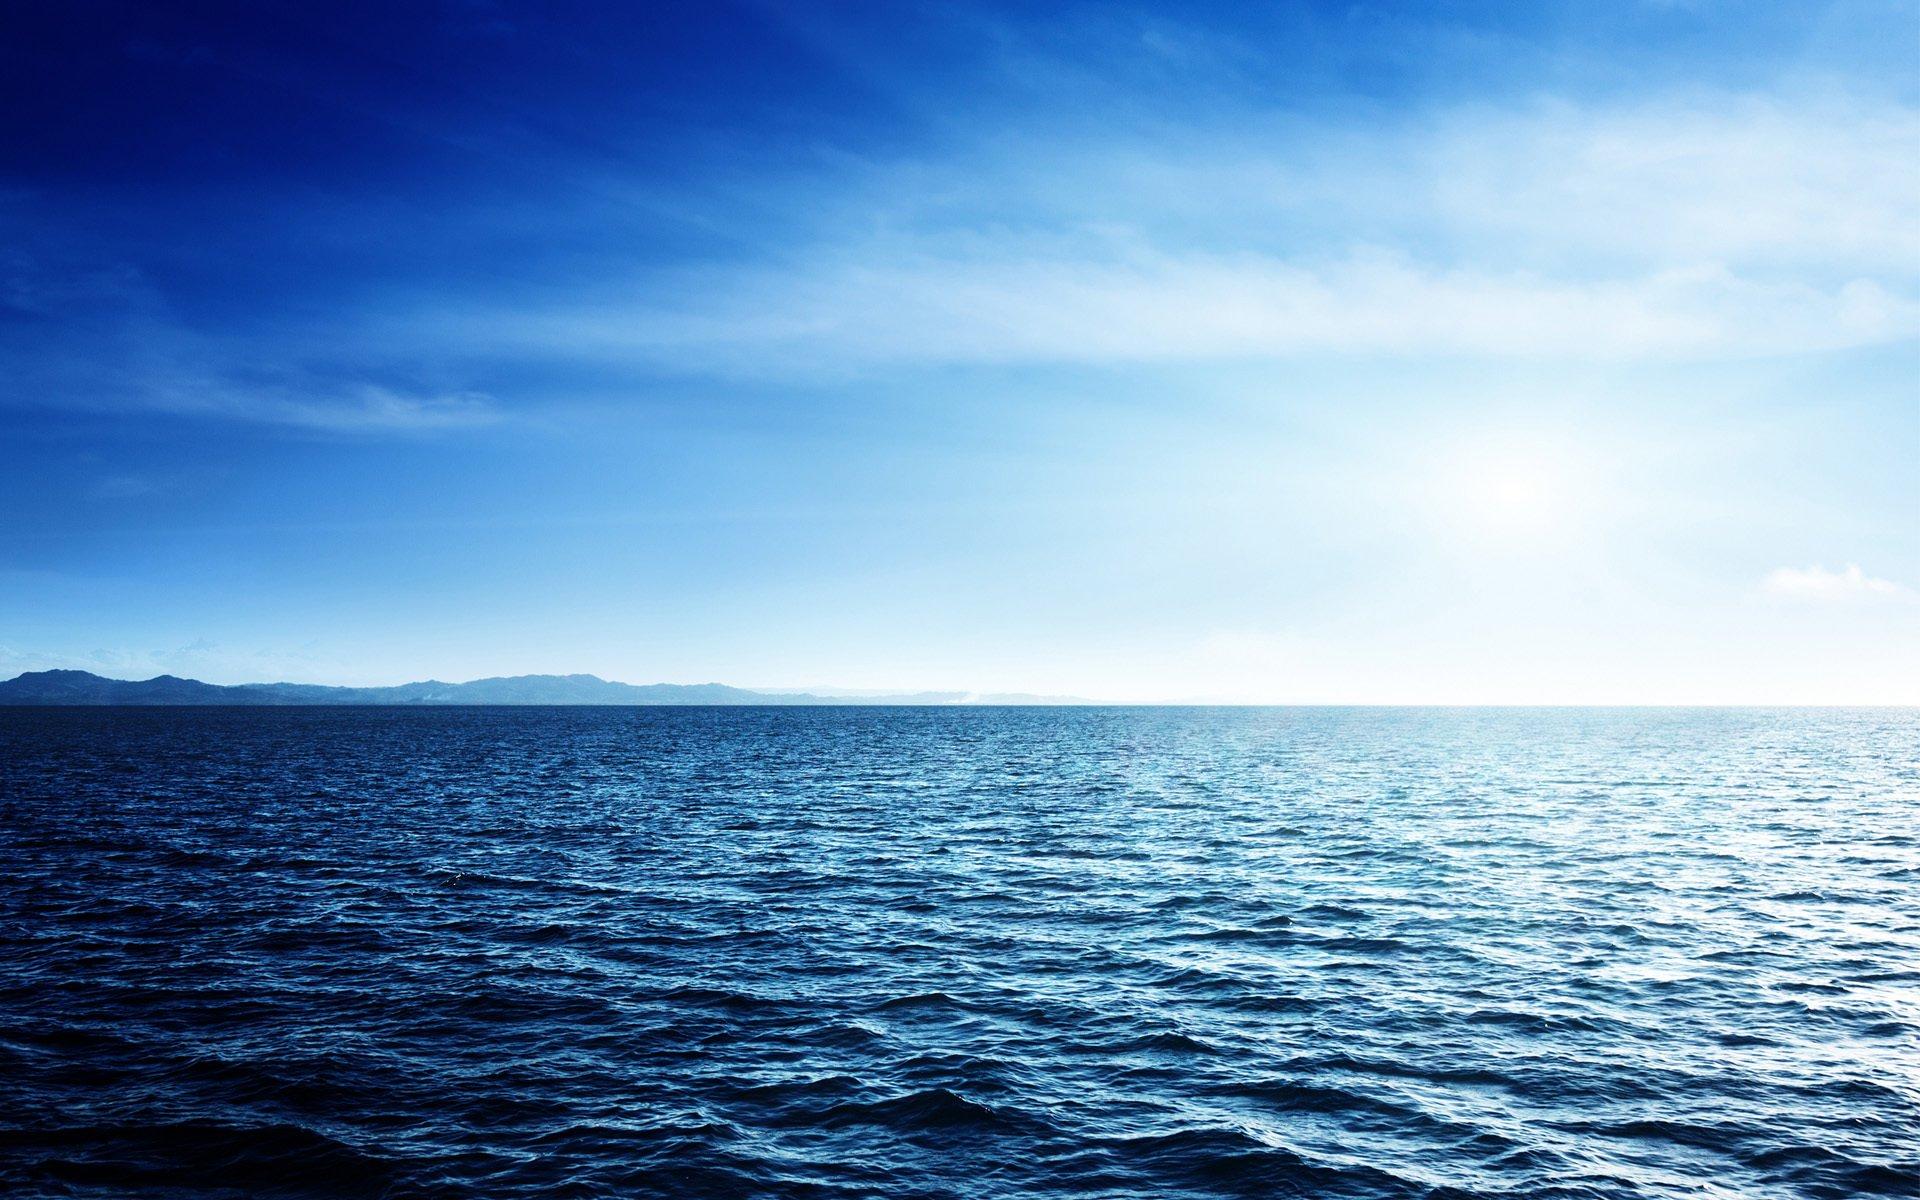 Картинки вод мирового океана